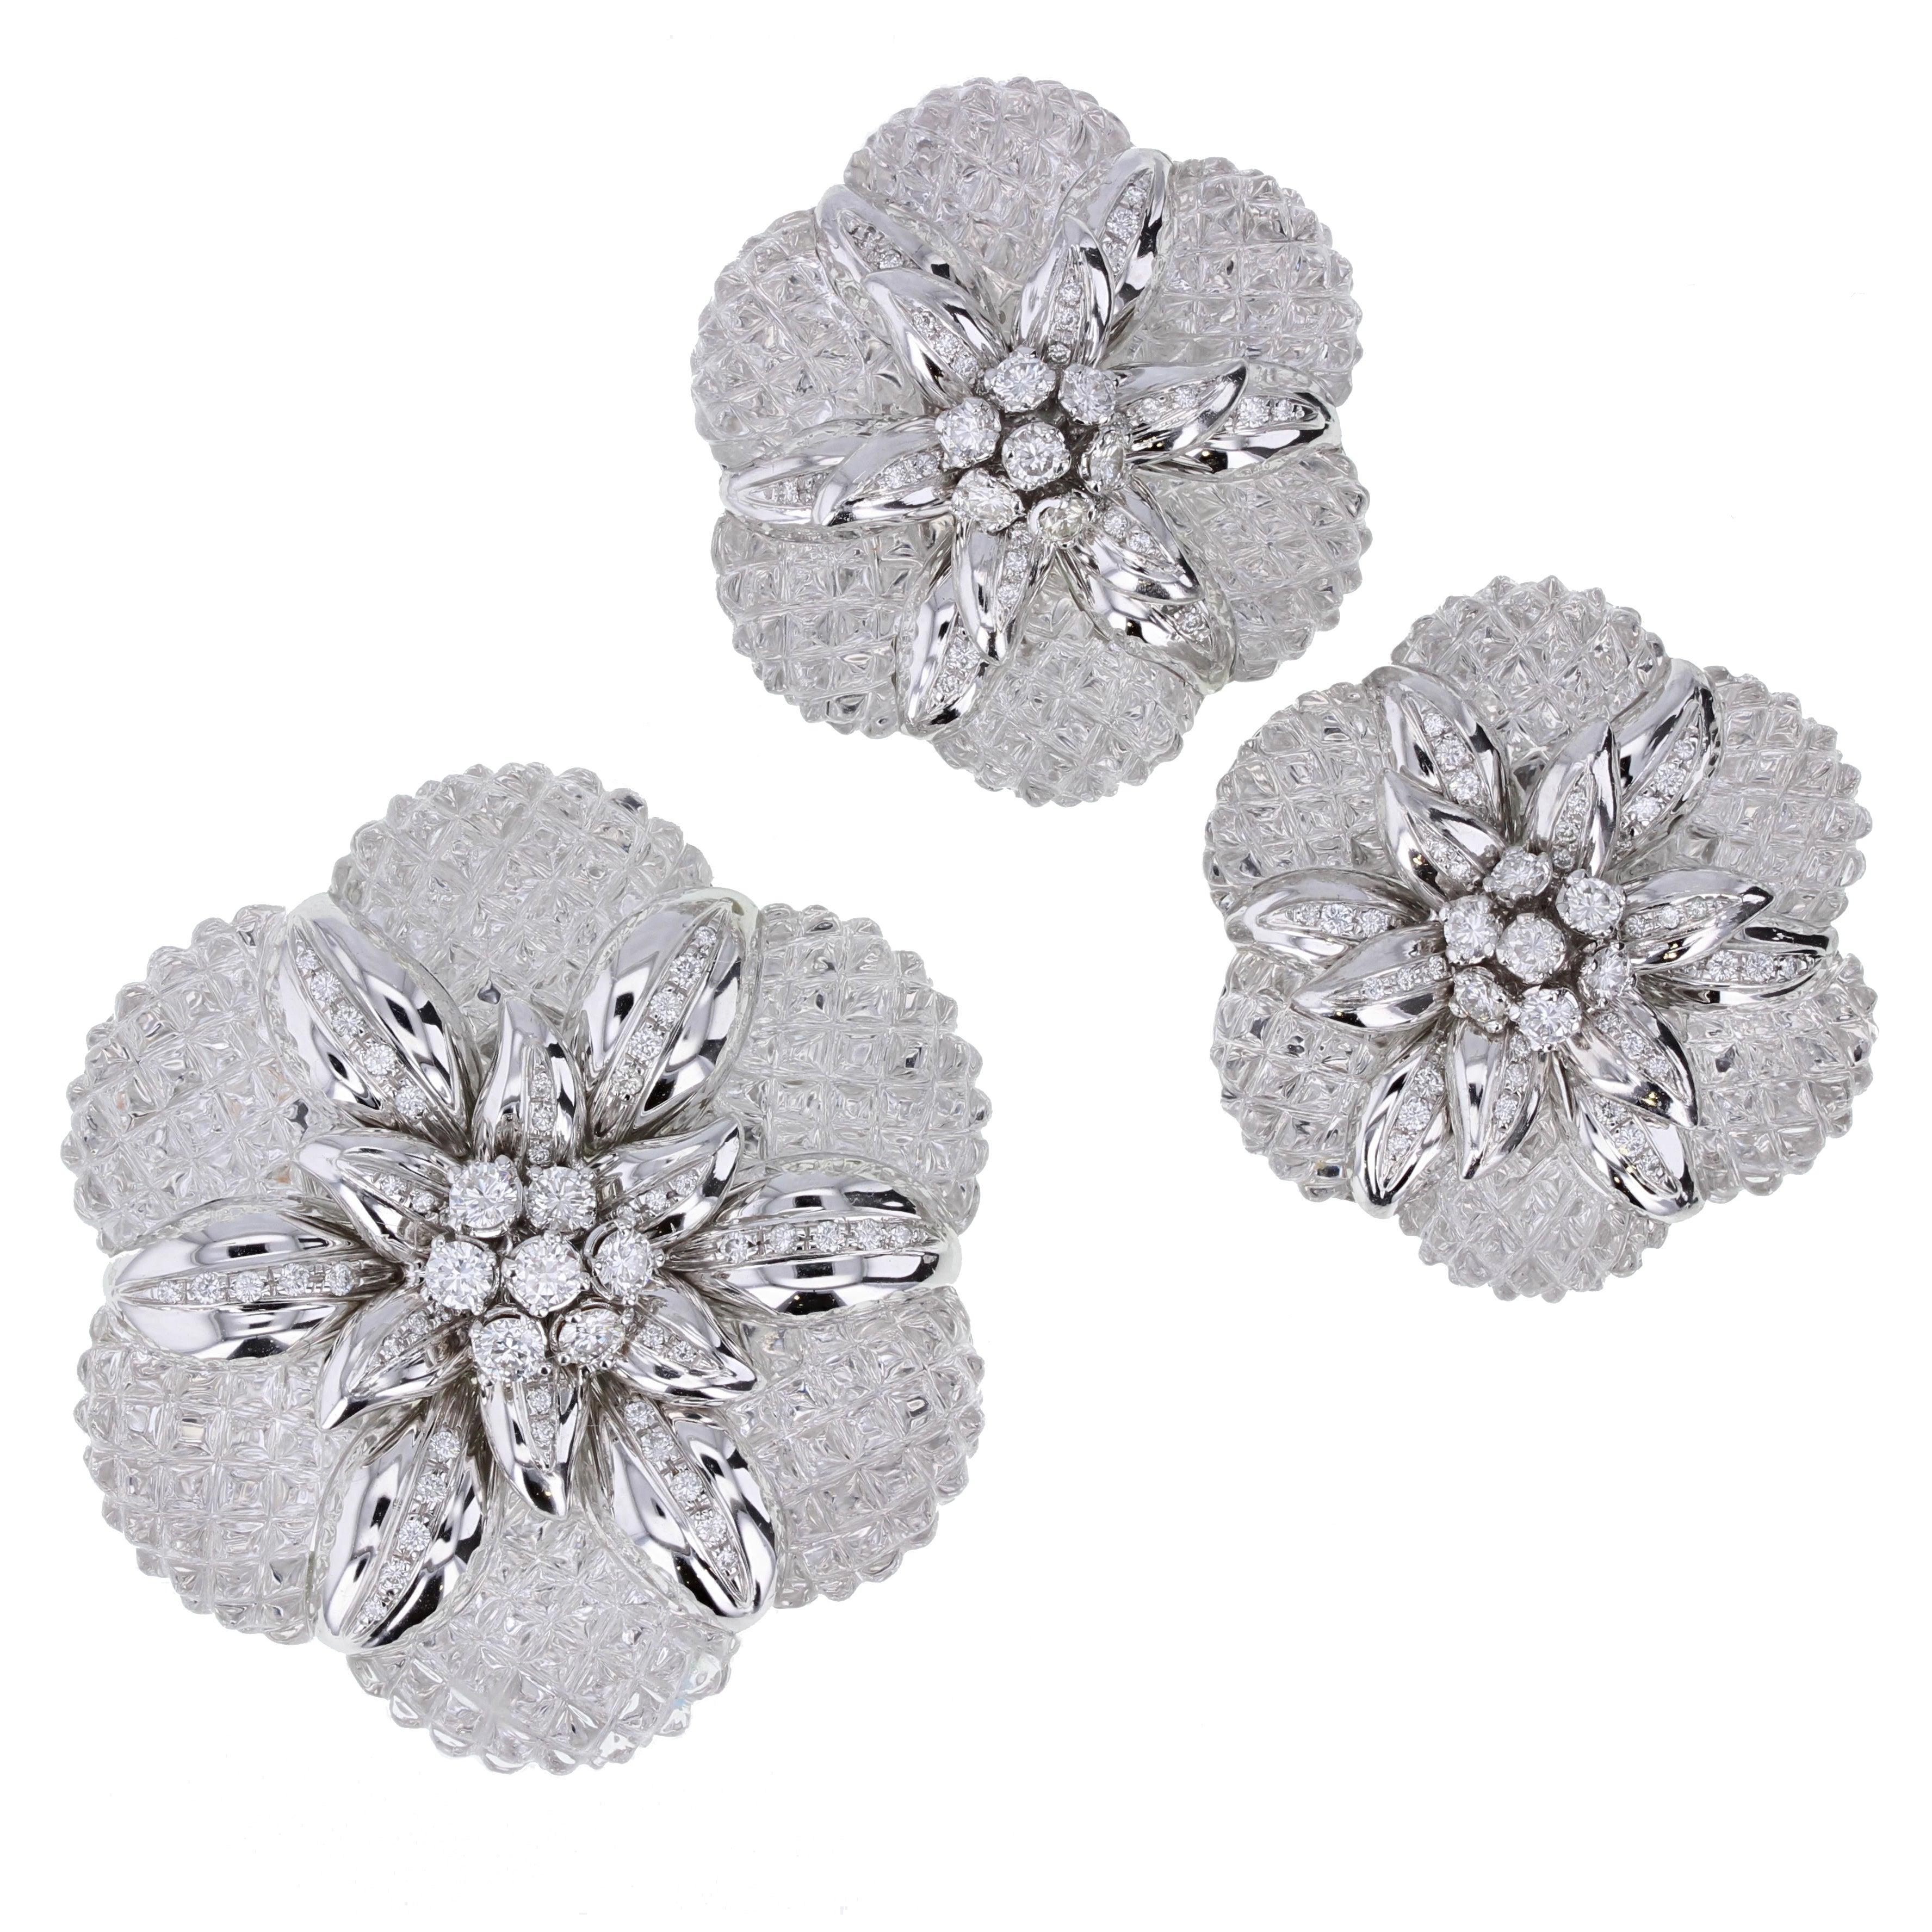 Sabbadini Rock Crystal Diamond Gold Brooch Earrings Demi-Parure